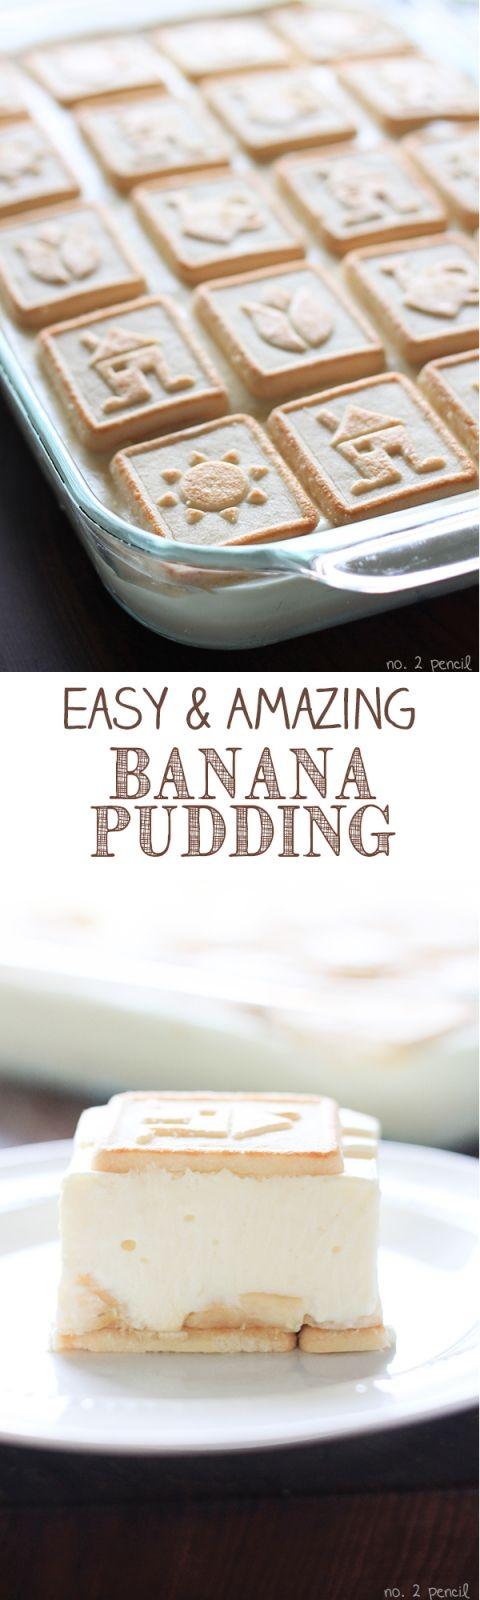 Easy and Amazing Banana Pudding